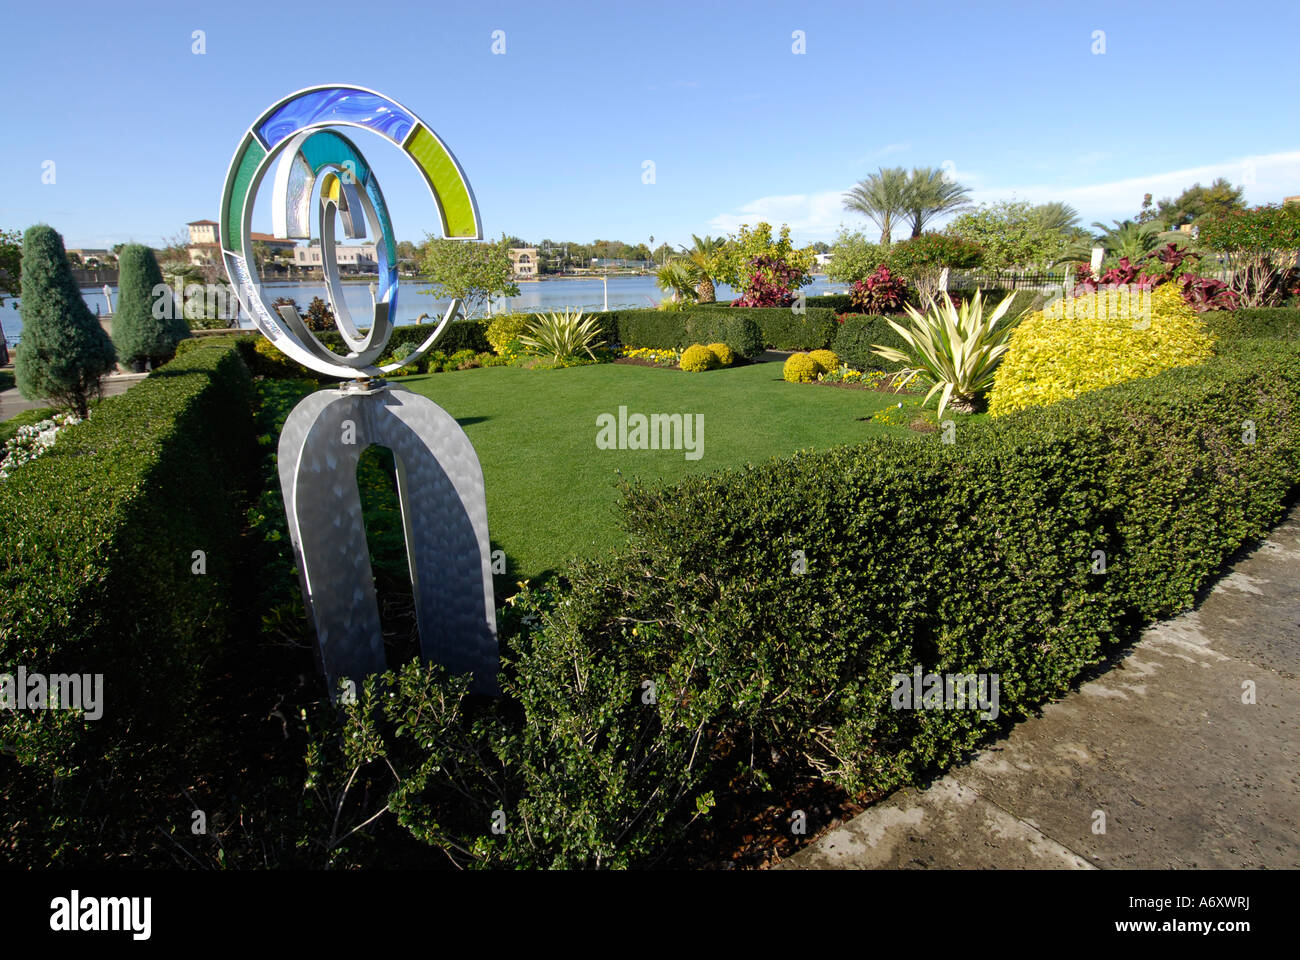 Hollis garden park in the heart of downtown lakeland florida fl usa